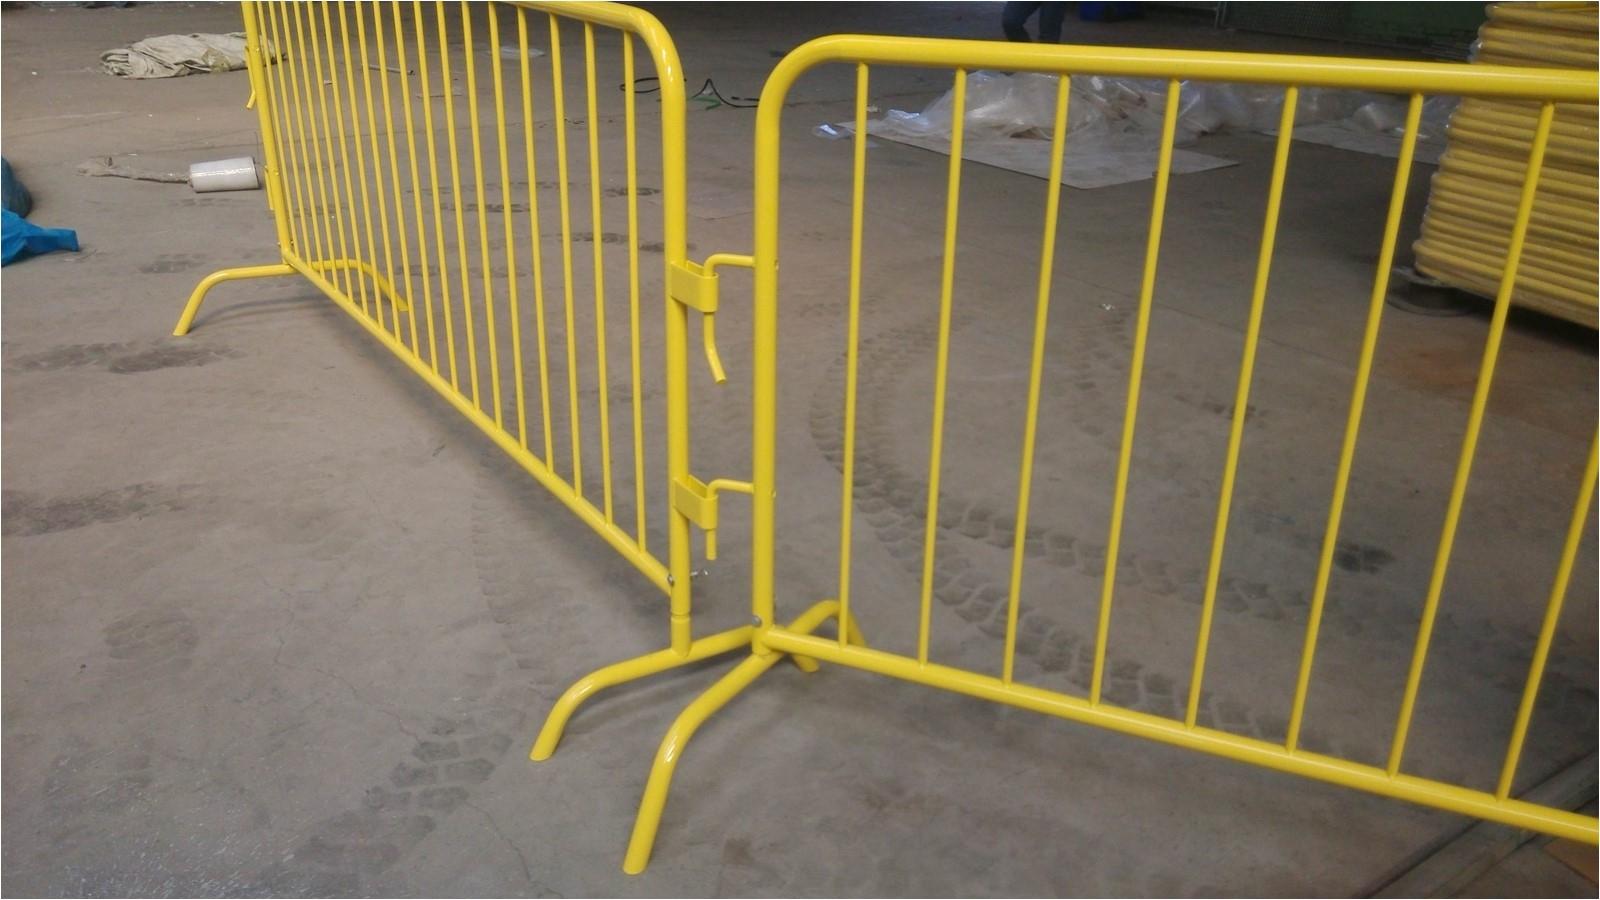 8metal galvanized steel bike rack crowd control barricade powder coated with bridge feet